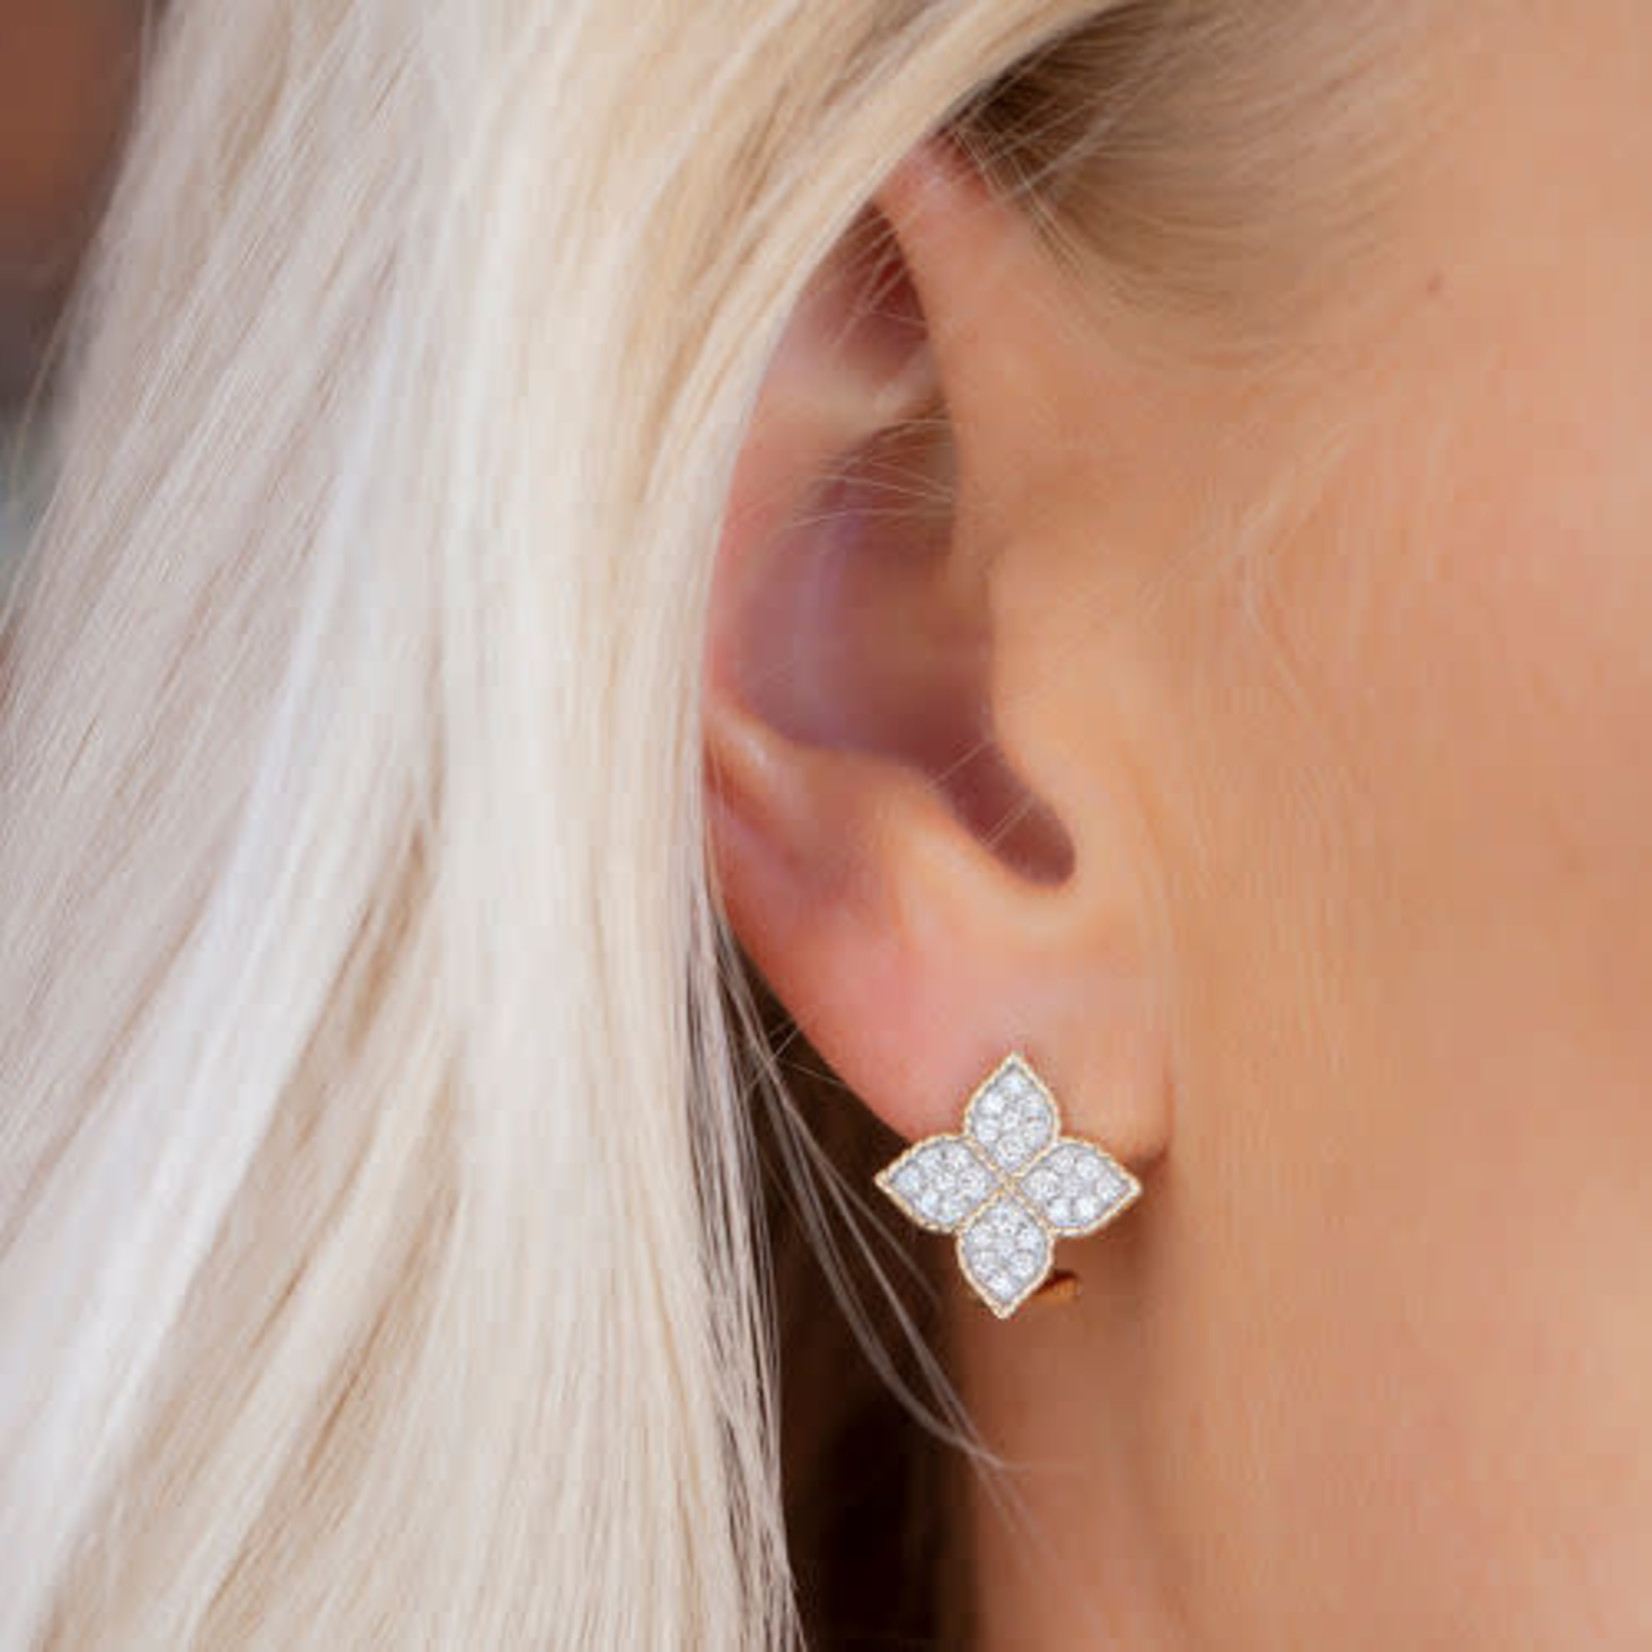 14KY Diamond Pave Clover Earrings